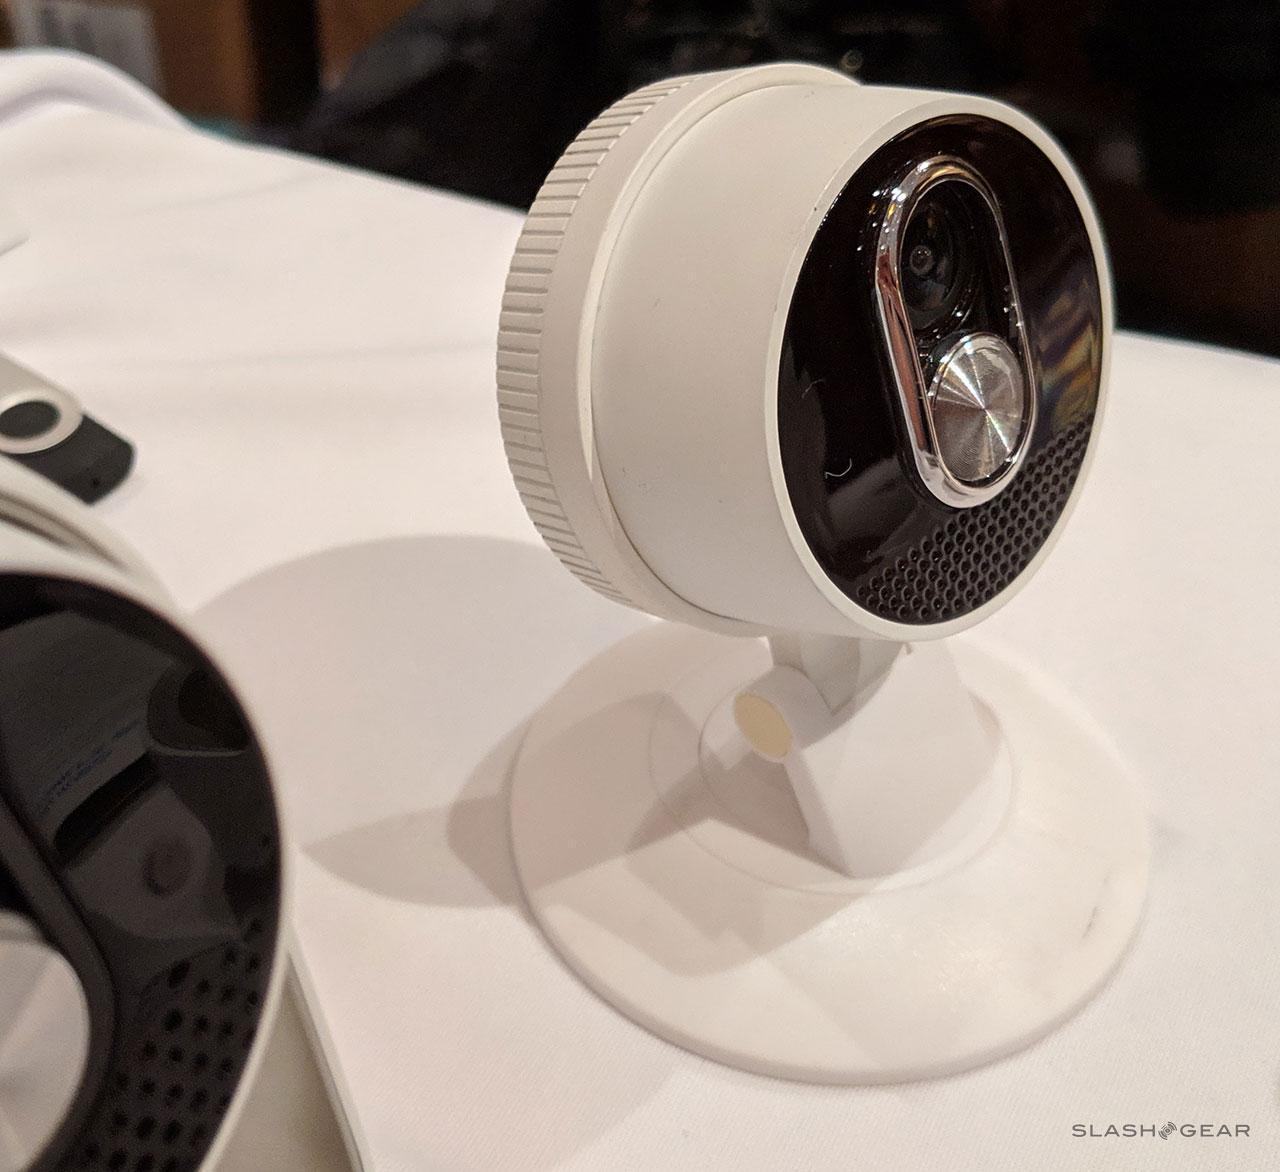 Motorola Dox modular hands-on: One camera, many mounts - SlashGear